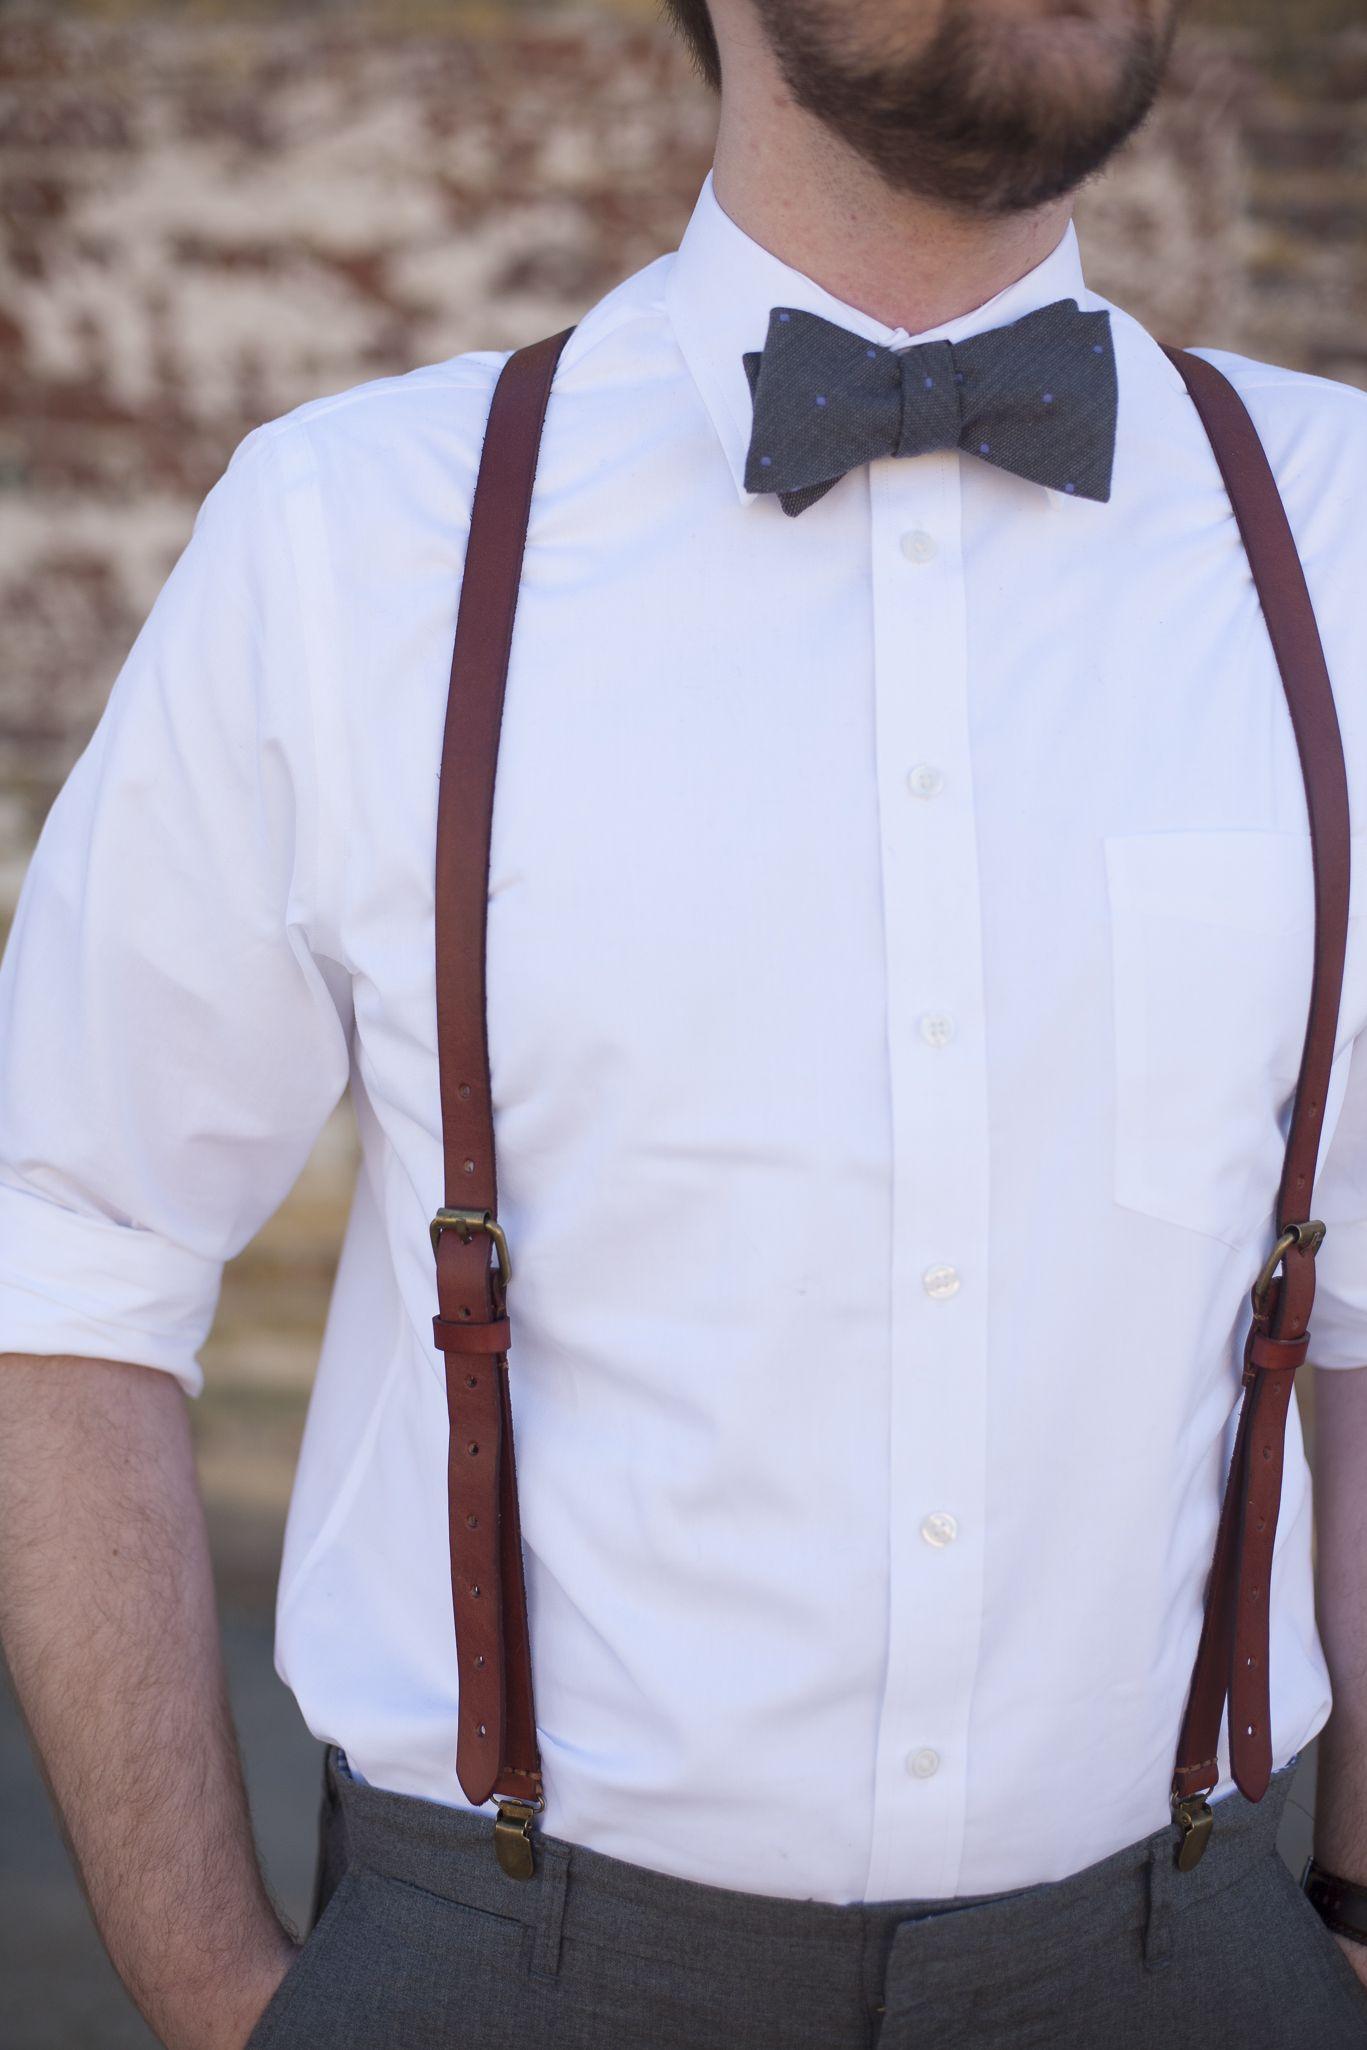 20+ Tan suit wedding suspenders ideas in 2021